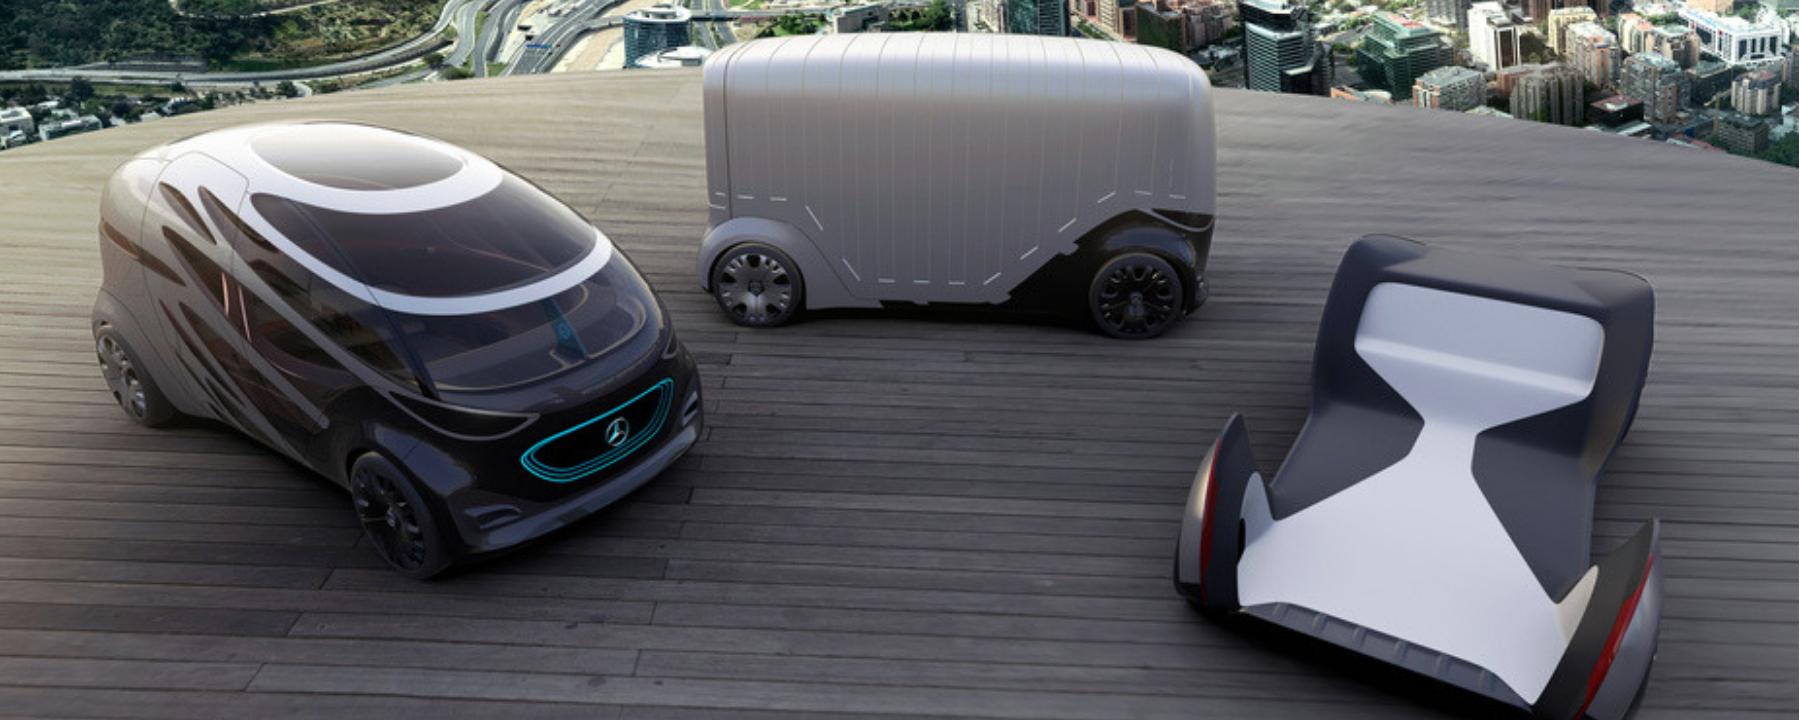 Mercedes-Benz Vans Concept